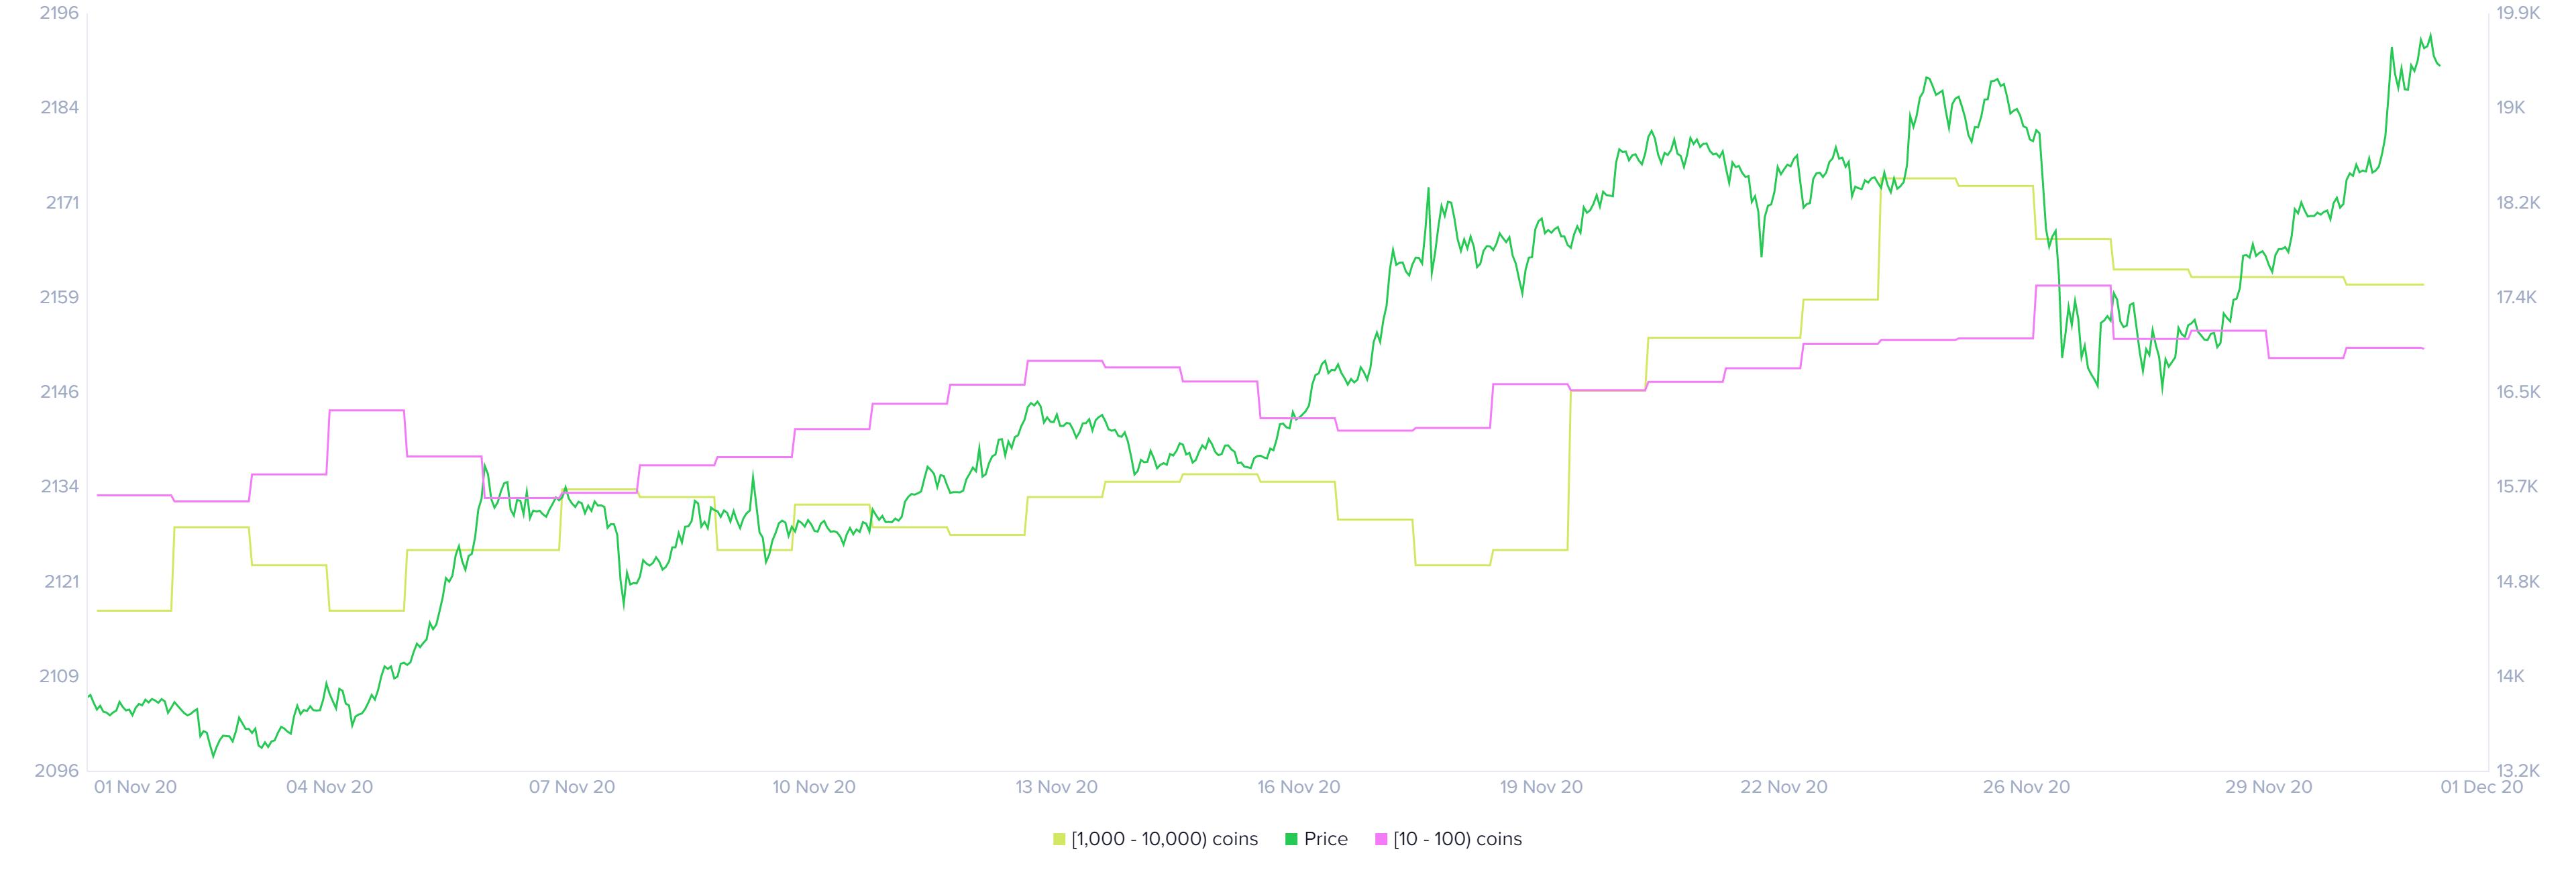 Bitcoin holder distribution chart